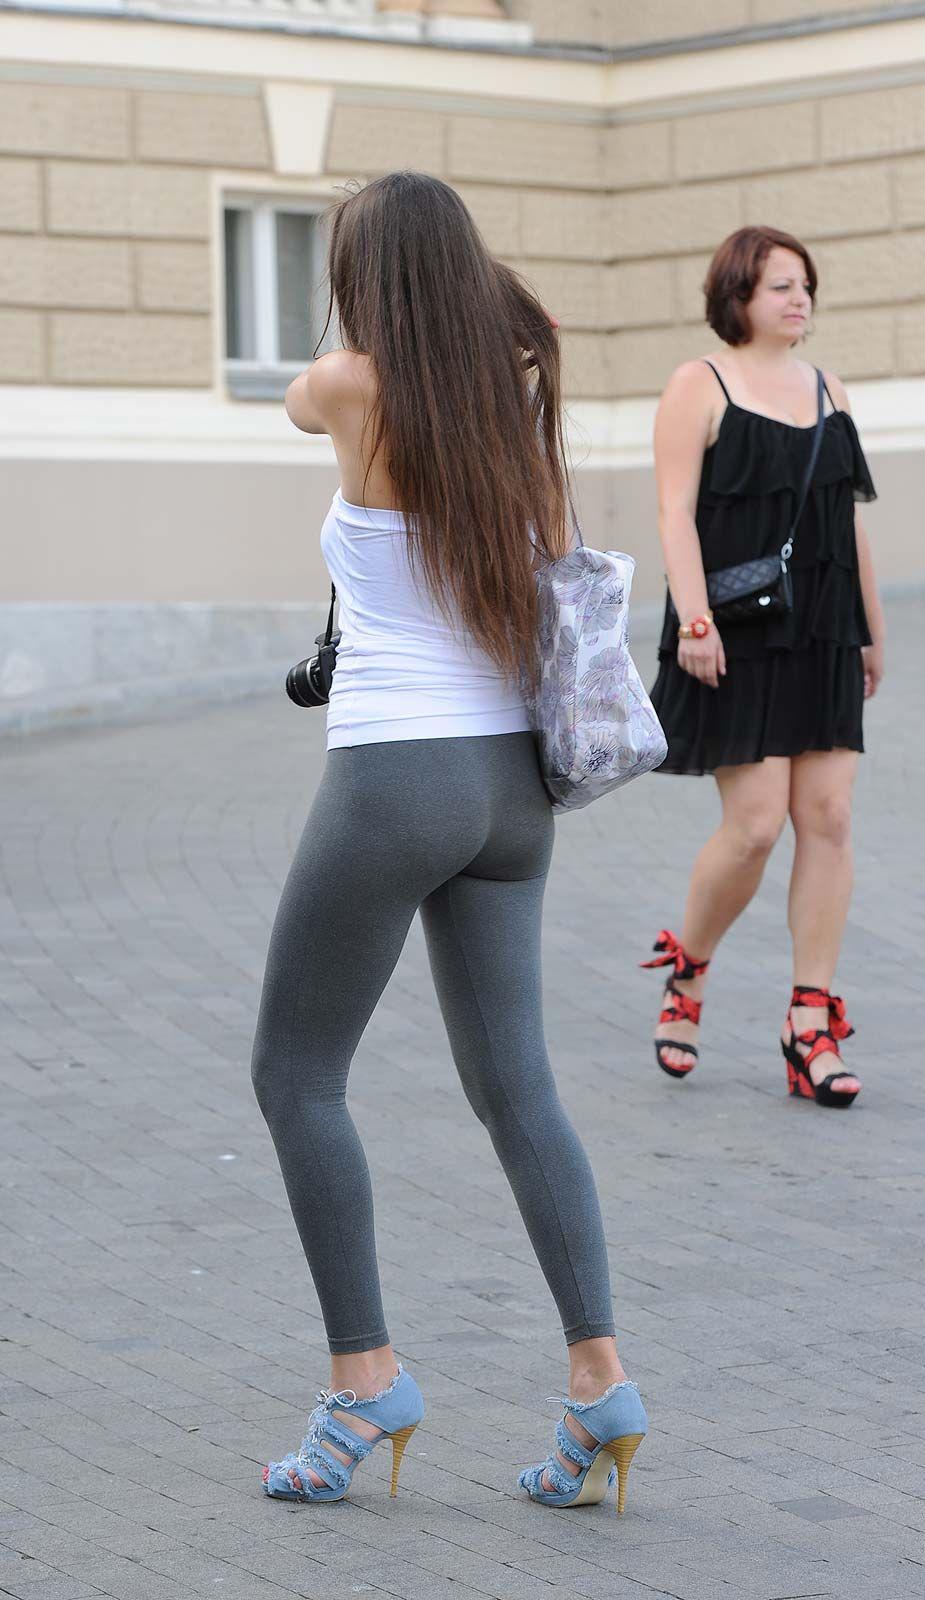 Tight backside - uPants | Girls | Yoga pants, Girls in ...